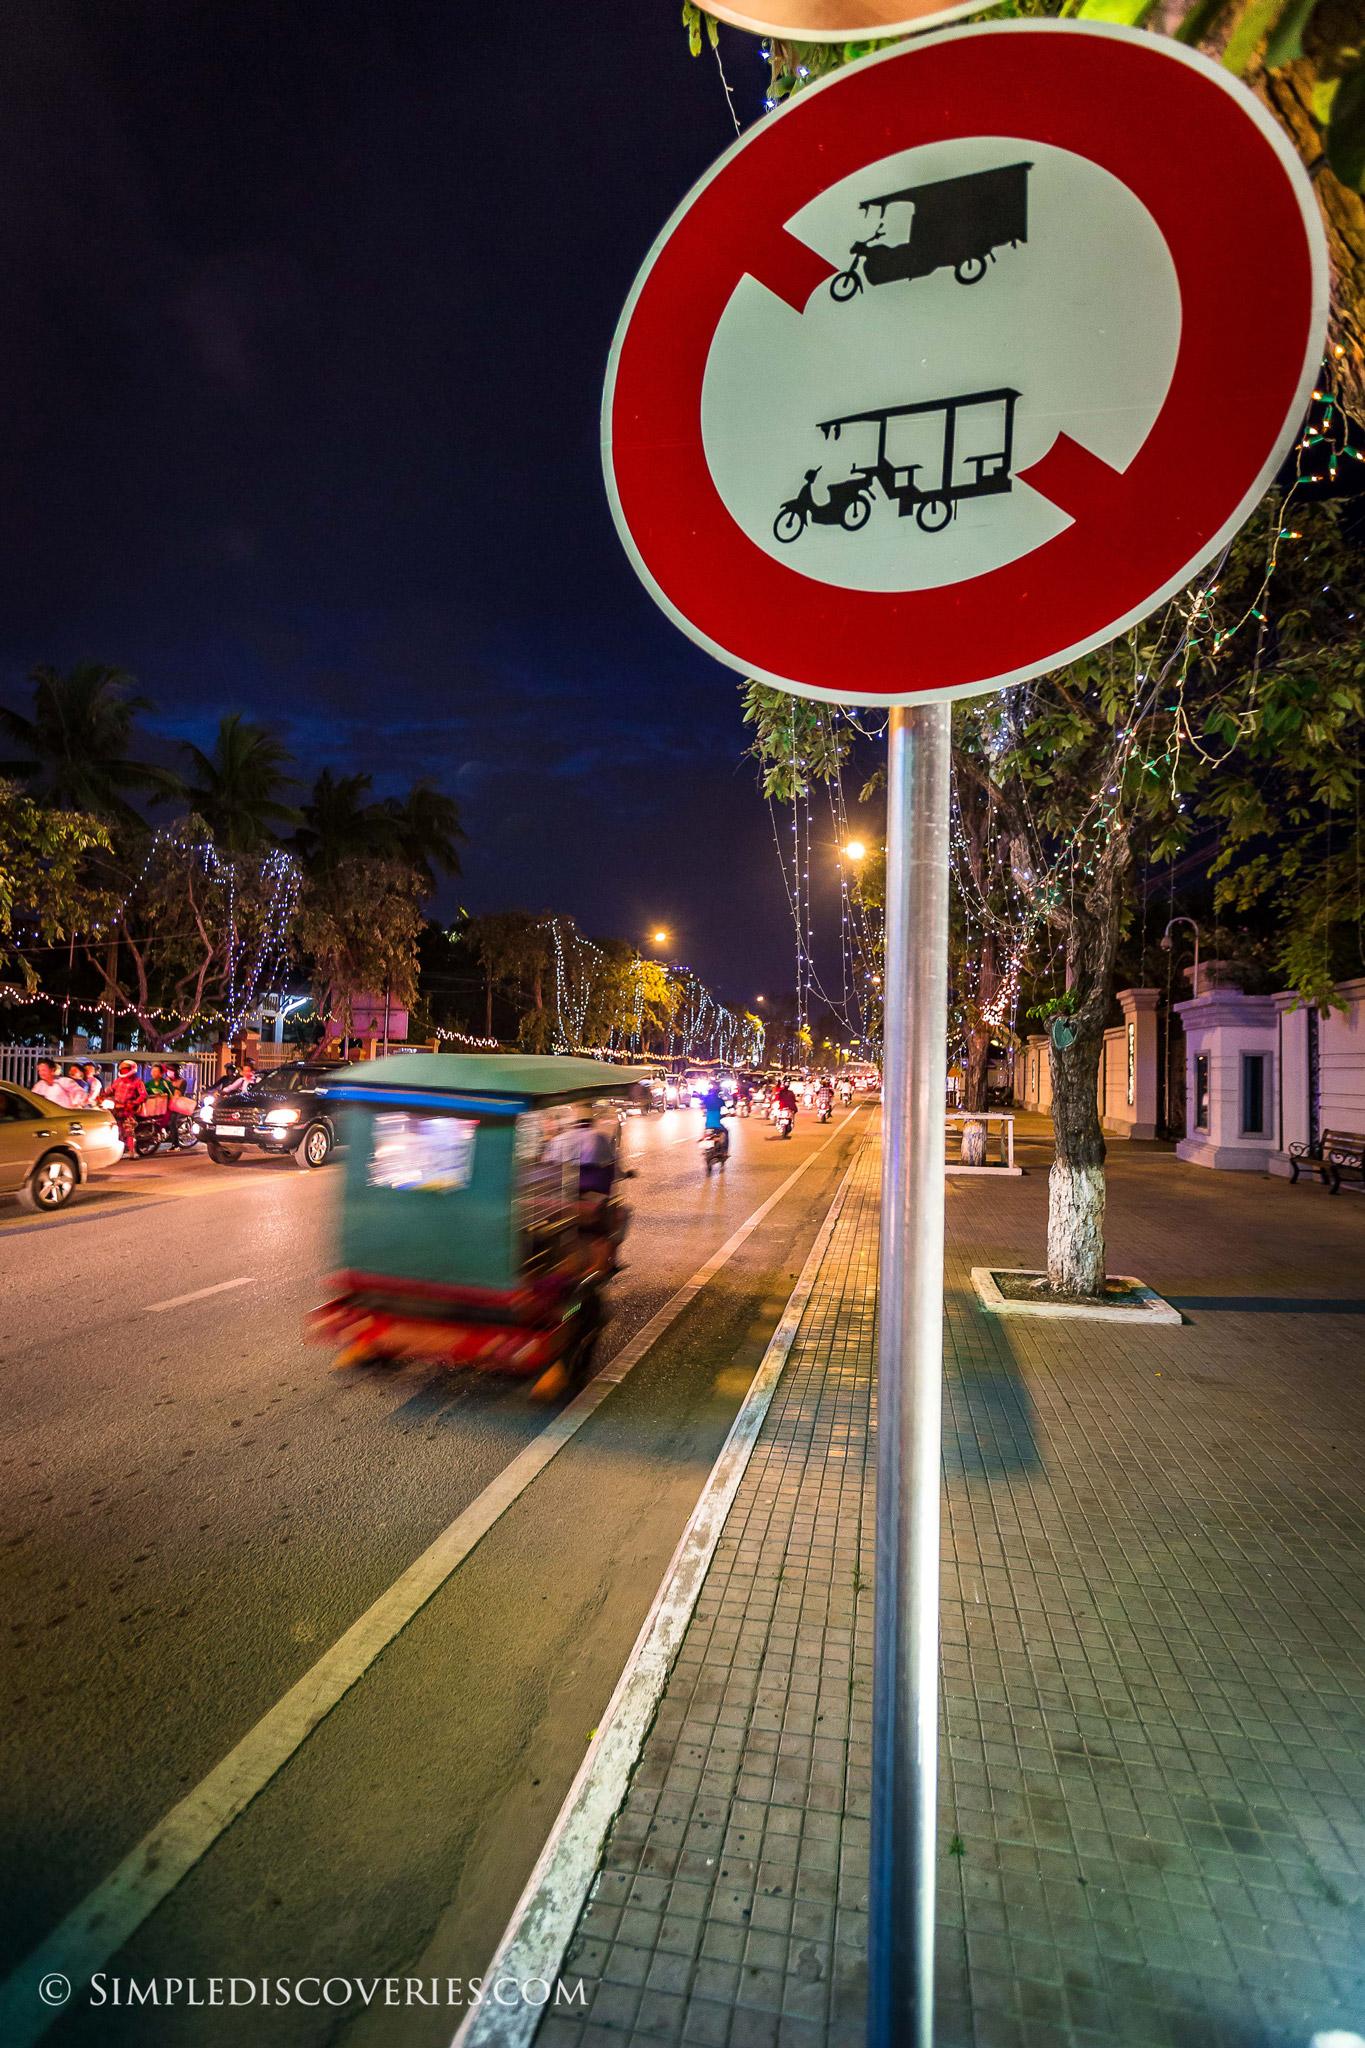 tuk_tuk_sign_cambodia